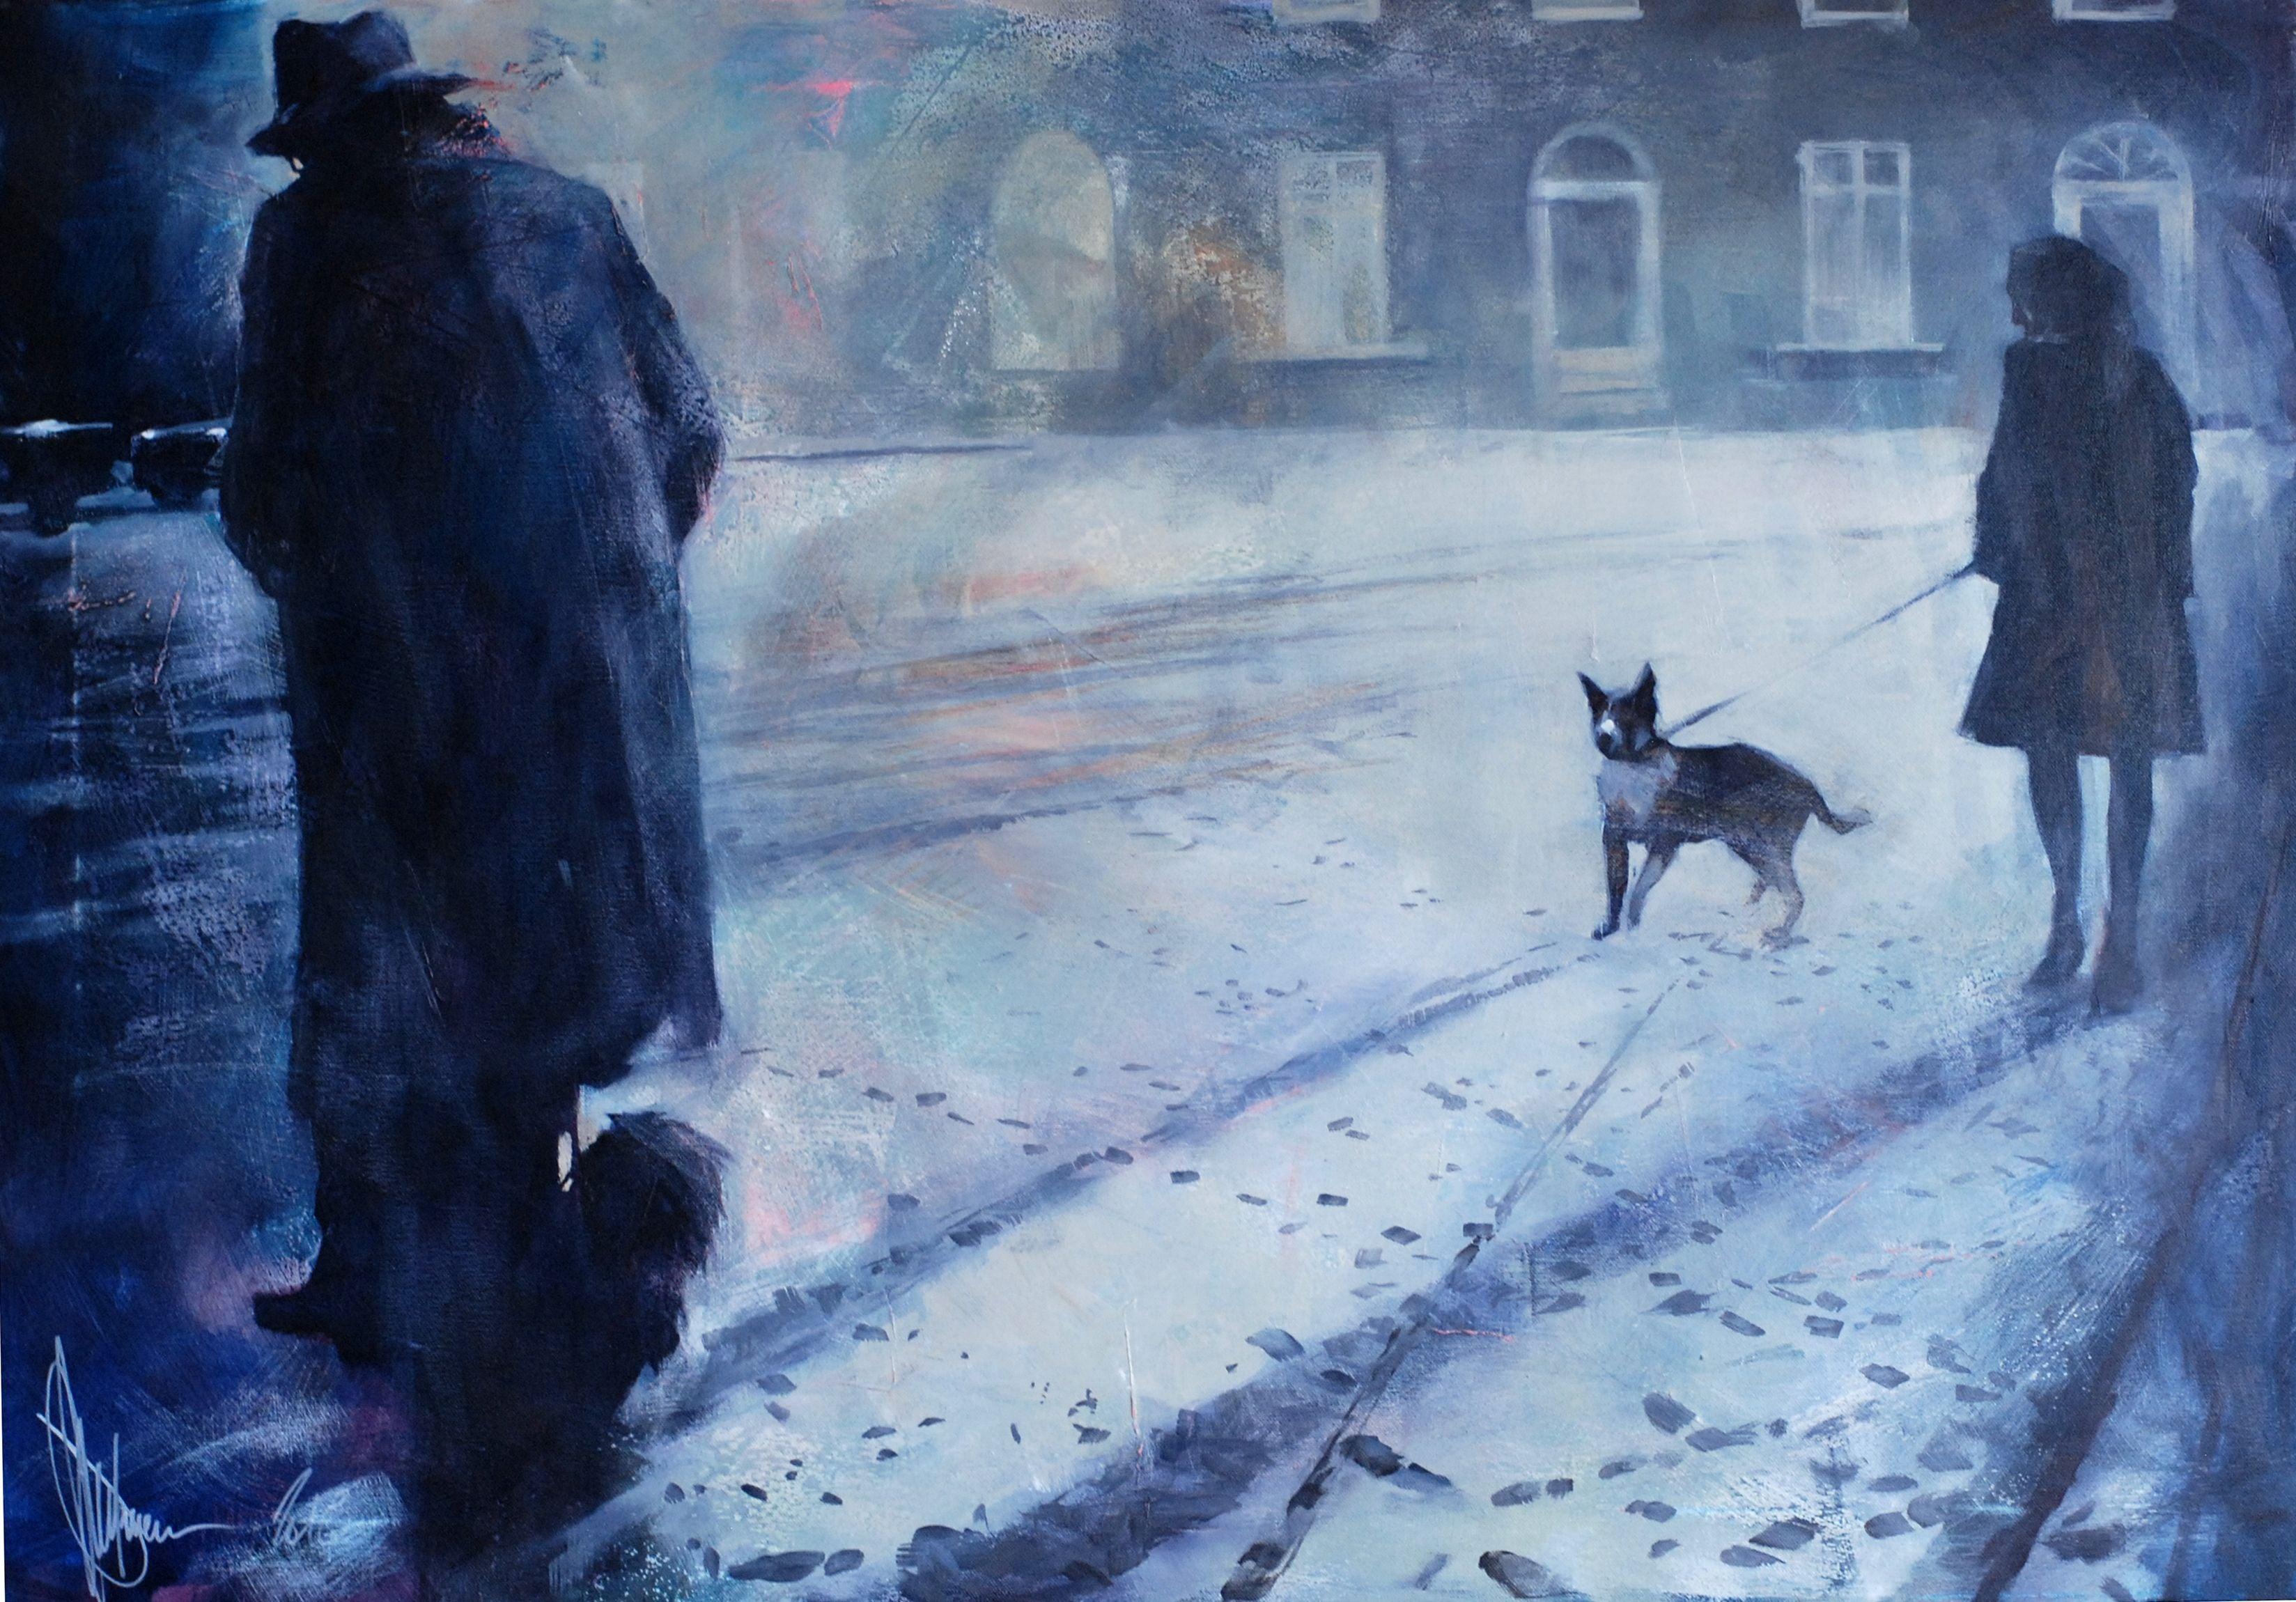 84035c738742 Igor Shulman - Night from Thursday to Friday., Painting, Oil on ...